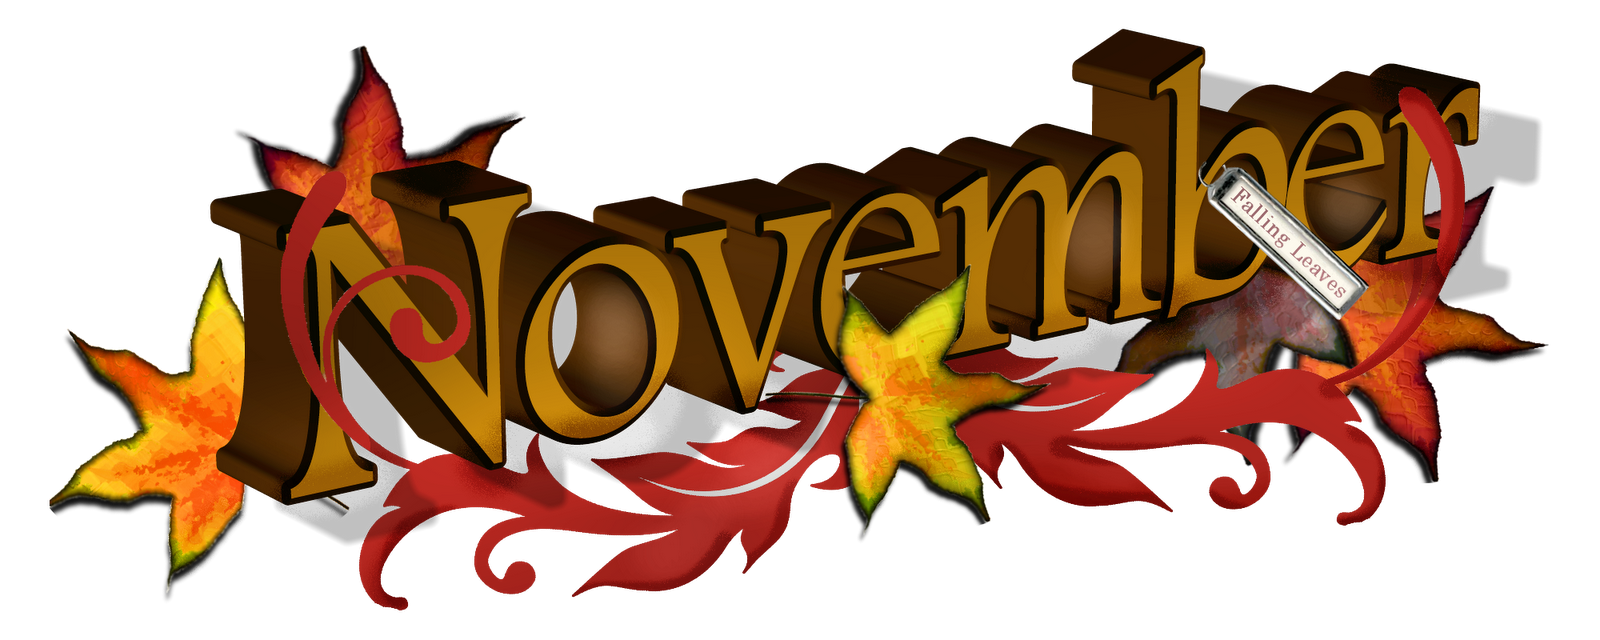 November clipart #4